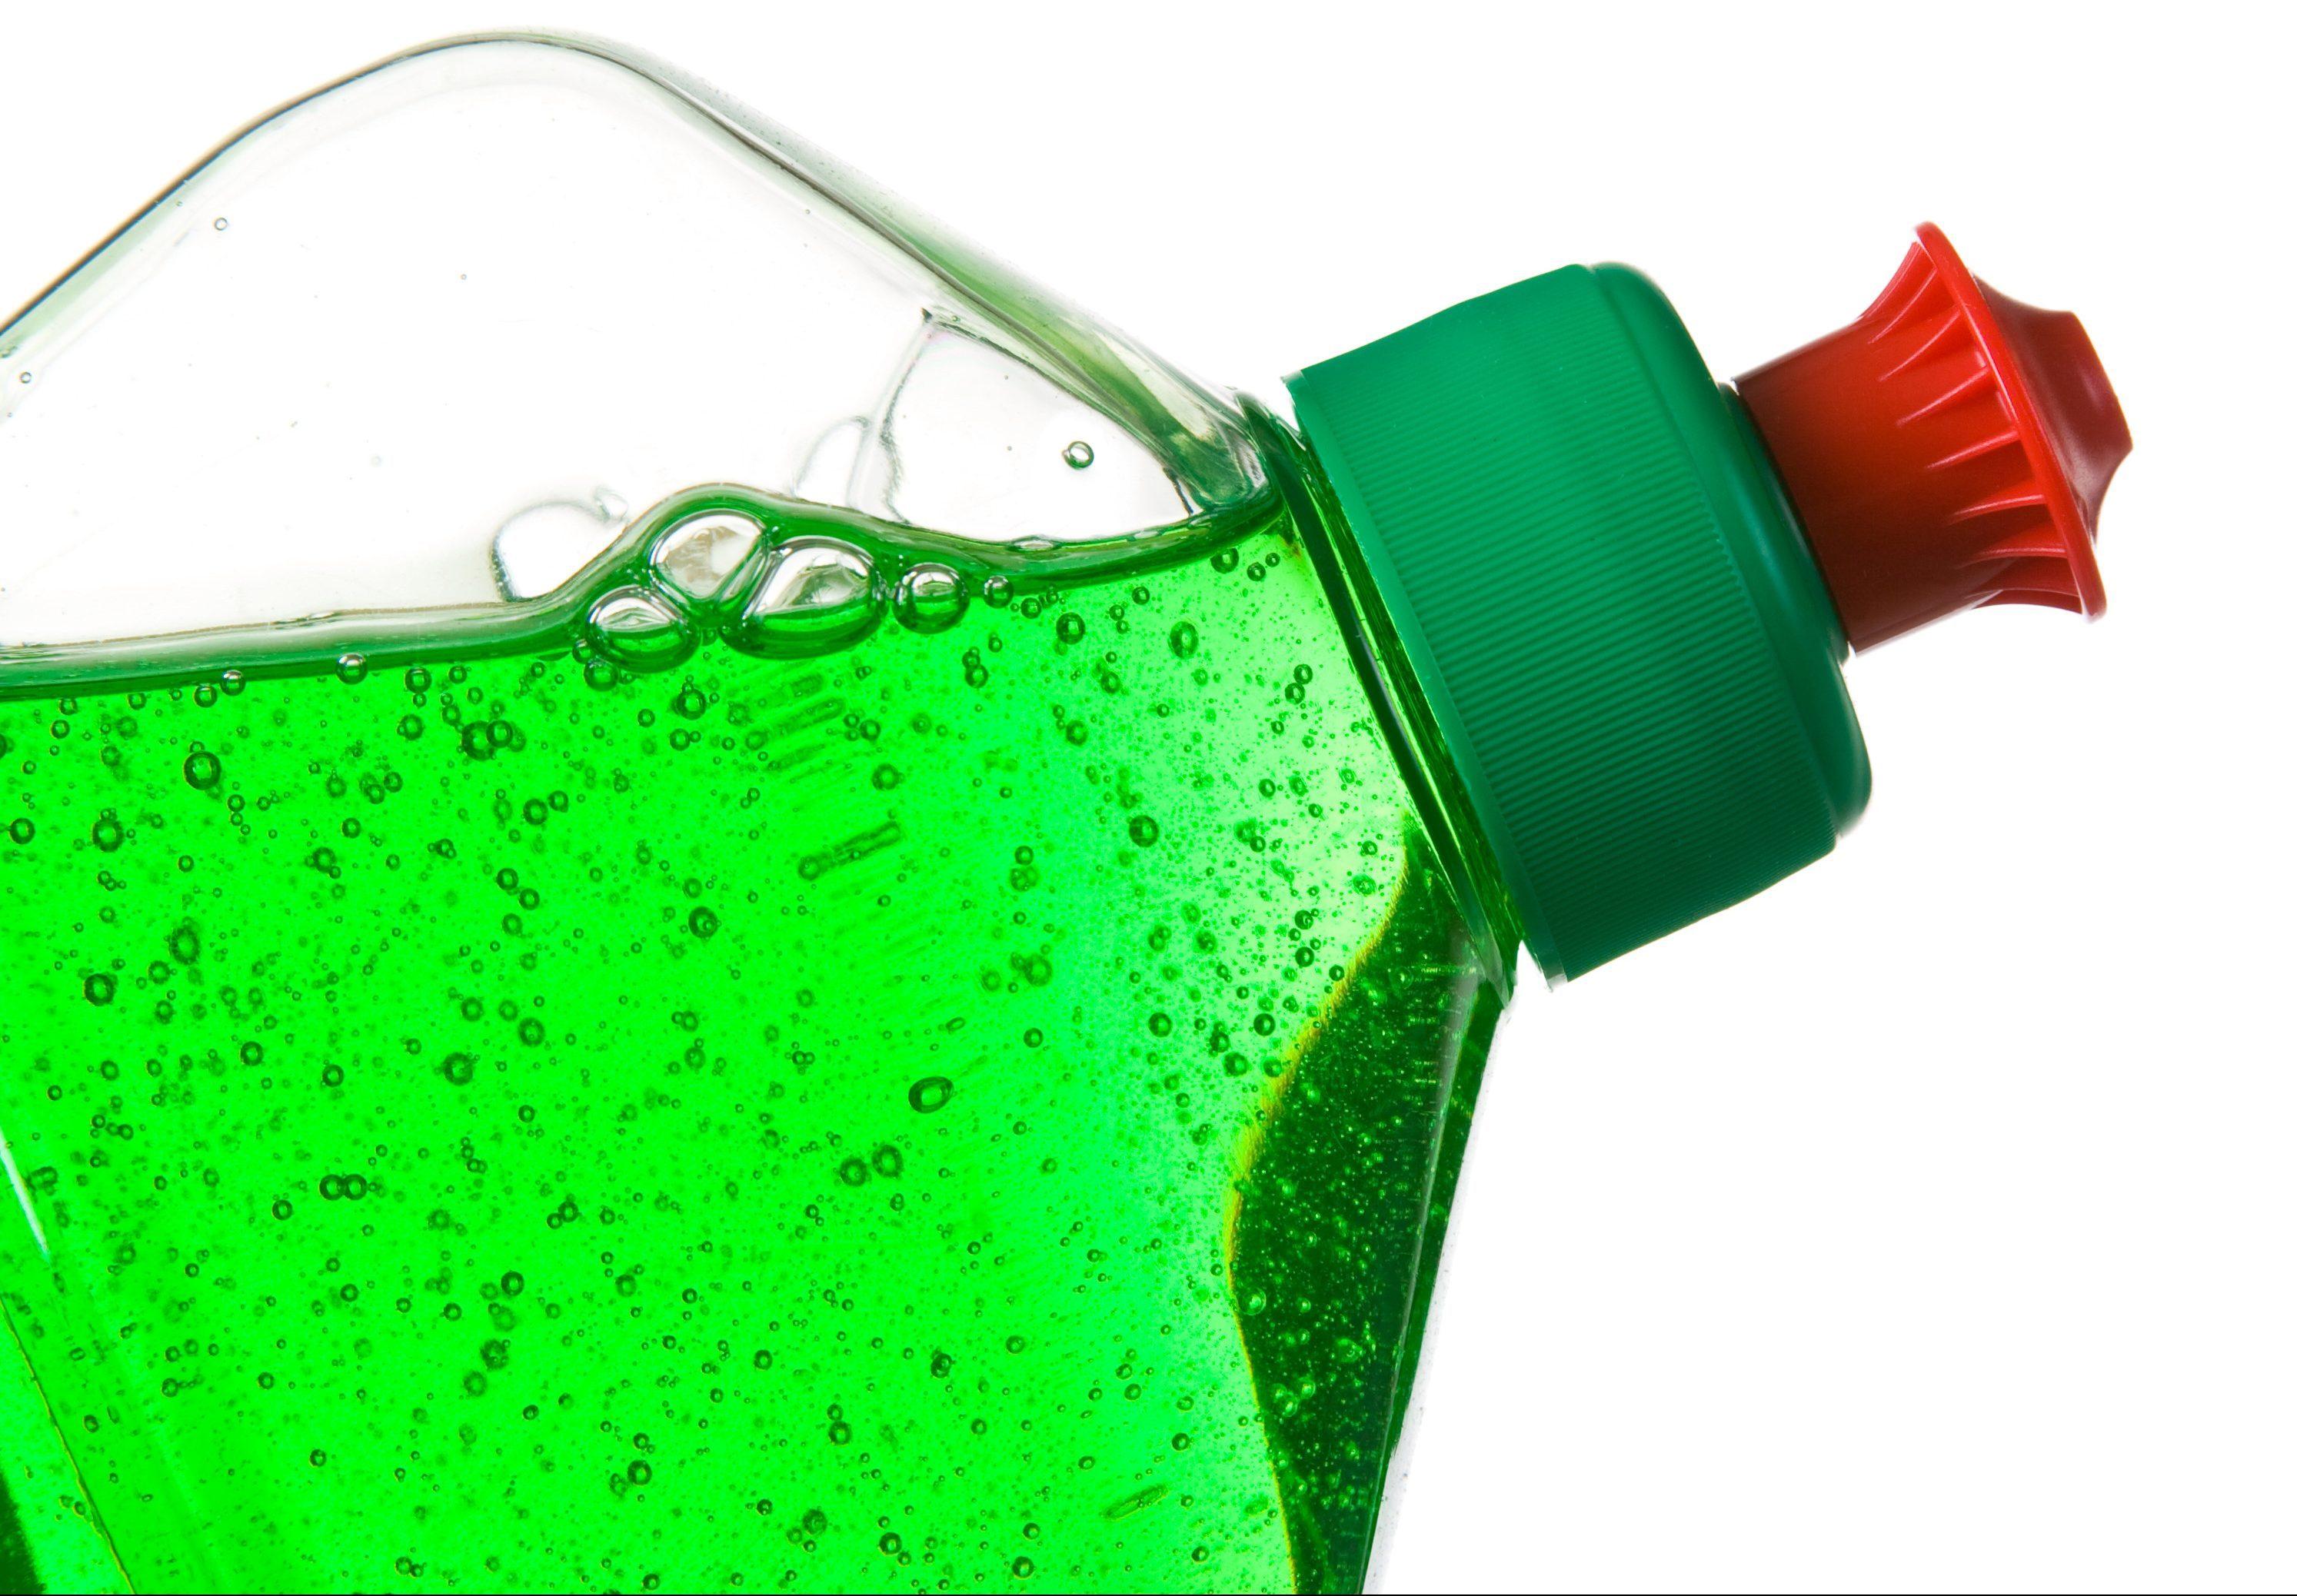 Washing up liquid can protect against coronavirus